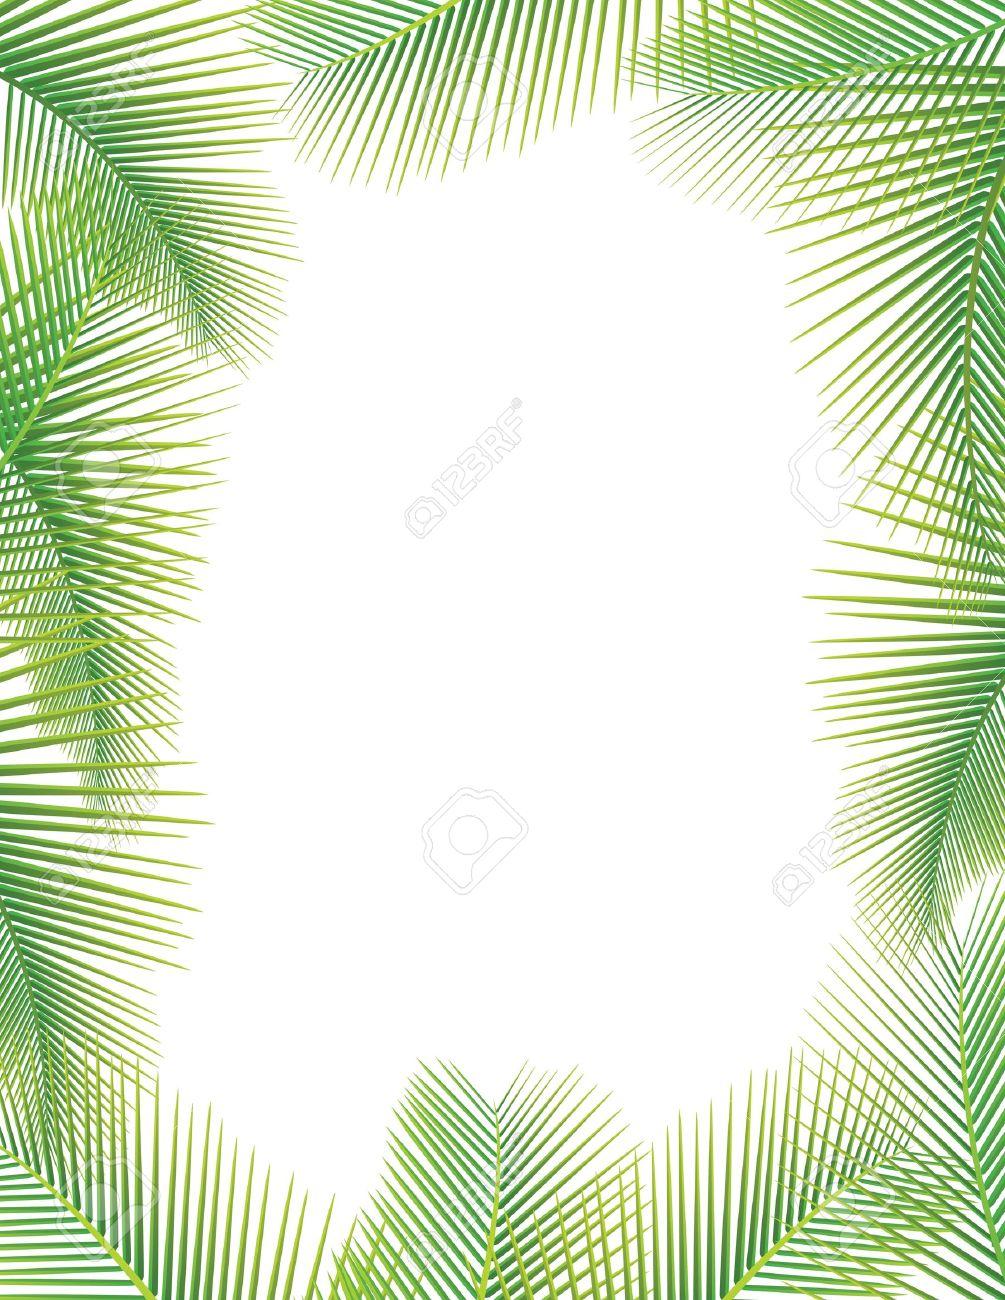 coconut leaf images u0026 stock pictures royalty free coconut leaf